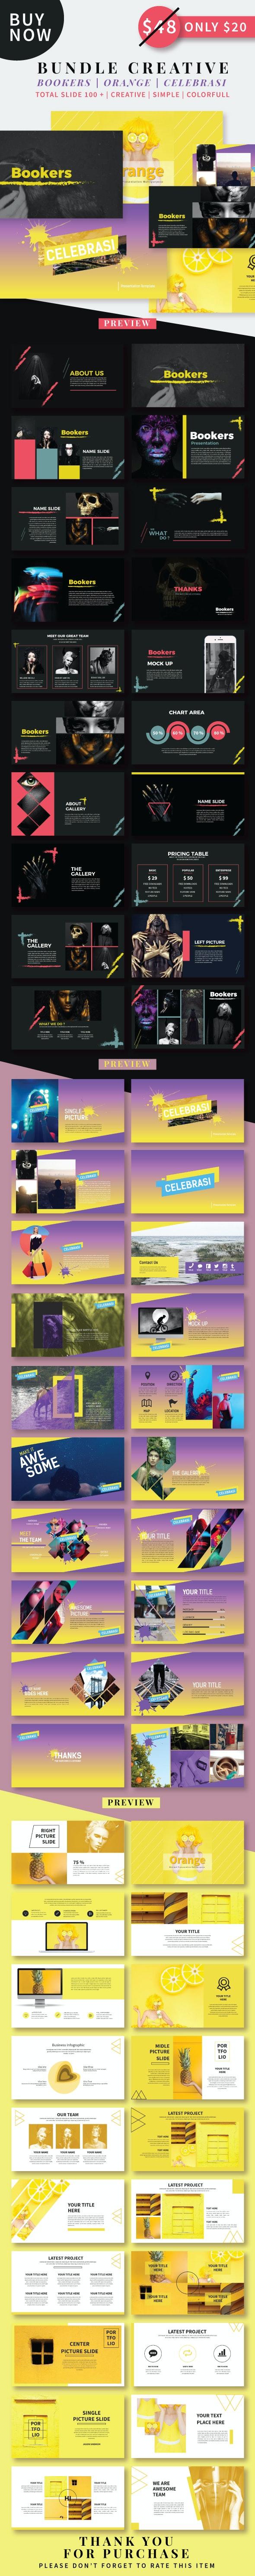 Creative Bundle 3in1 Keynote - Creative Keynote Templates